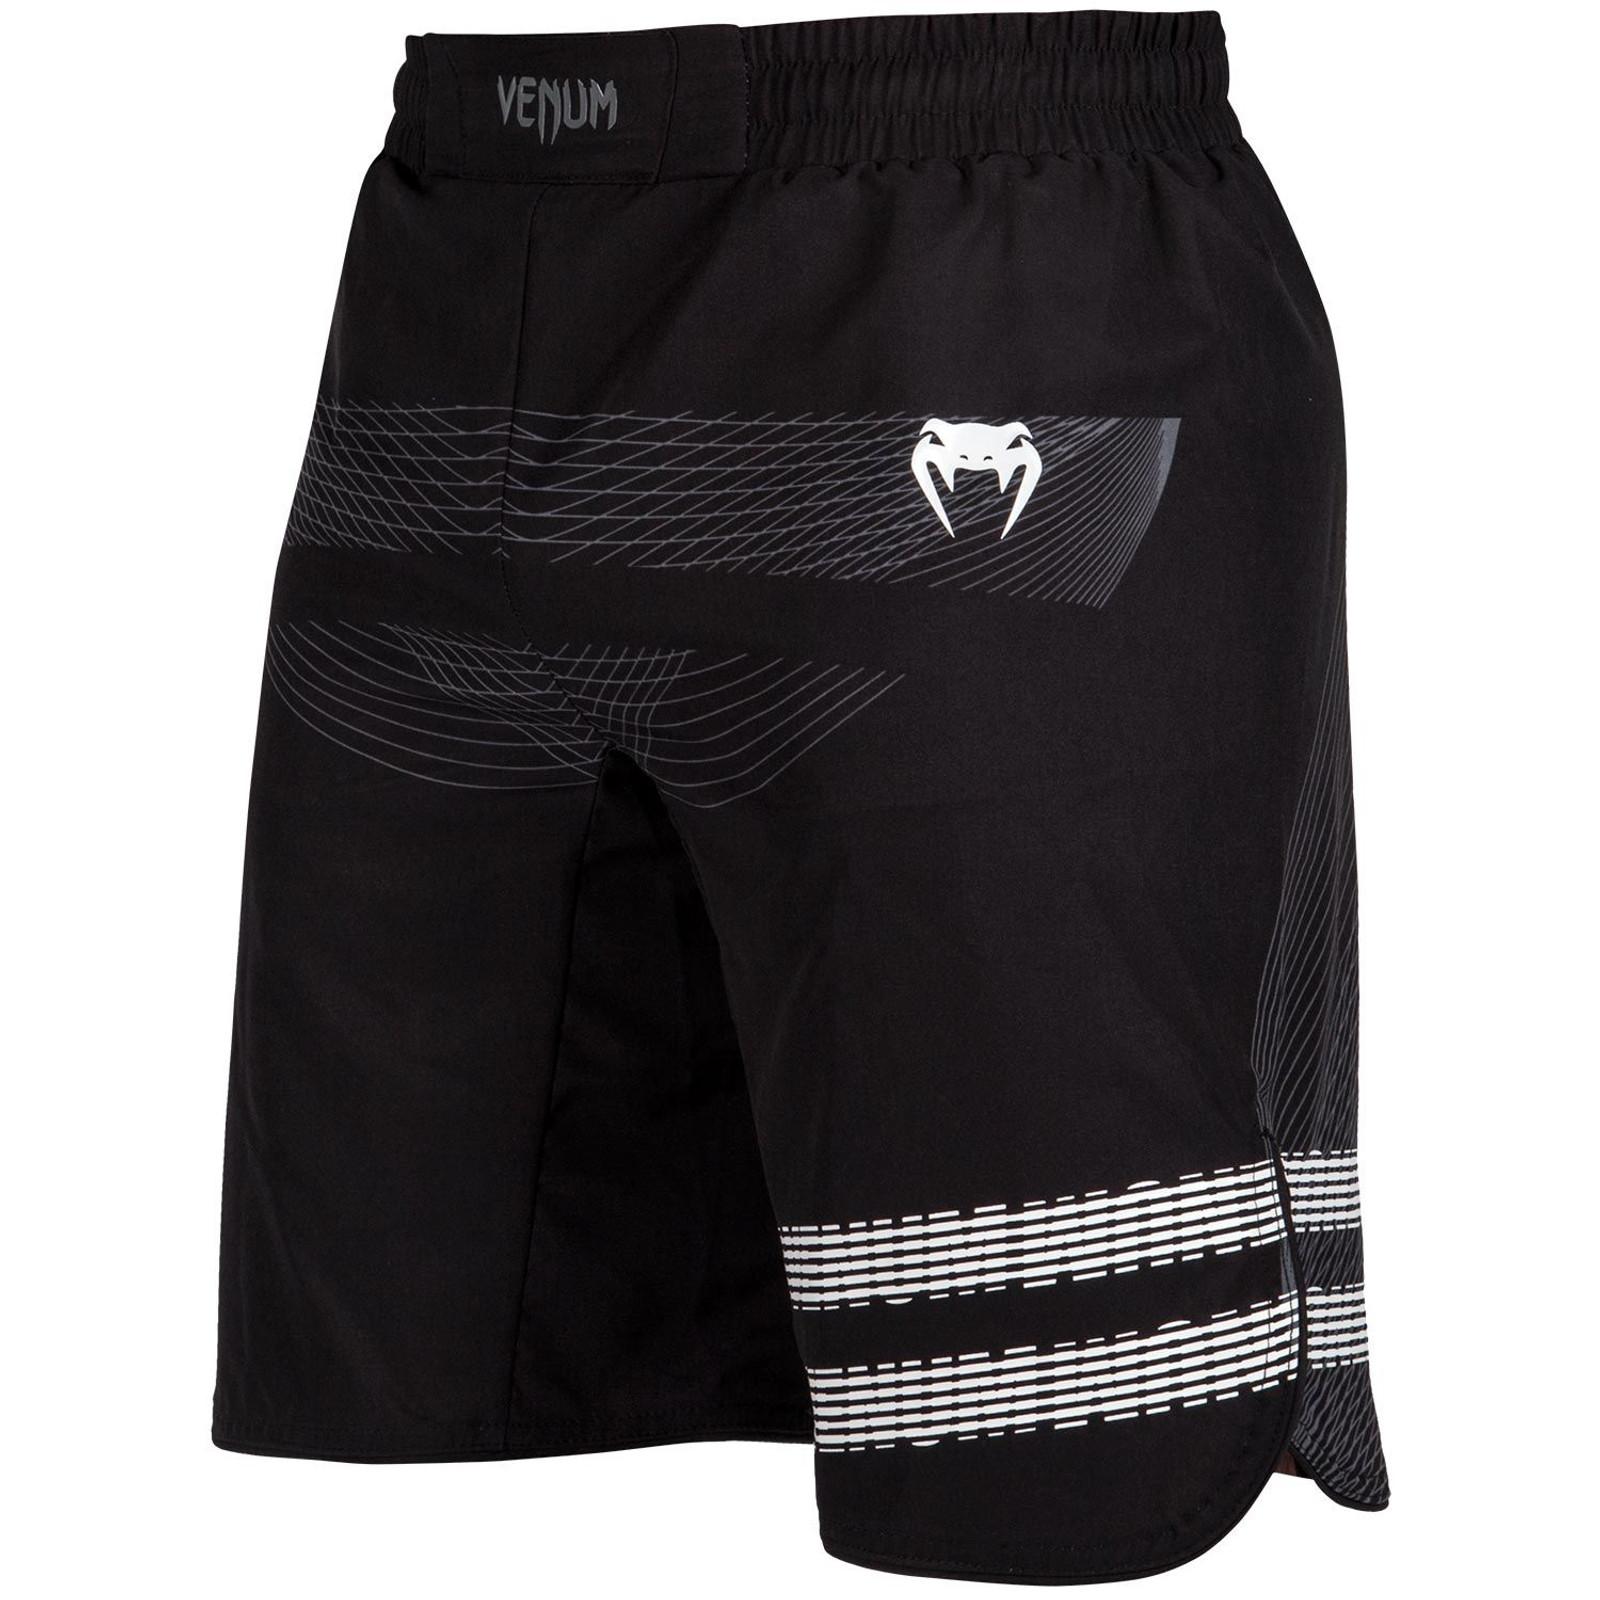 Venum Herren Training Shorts Club 182